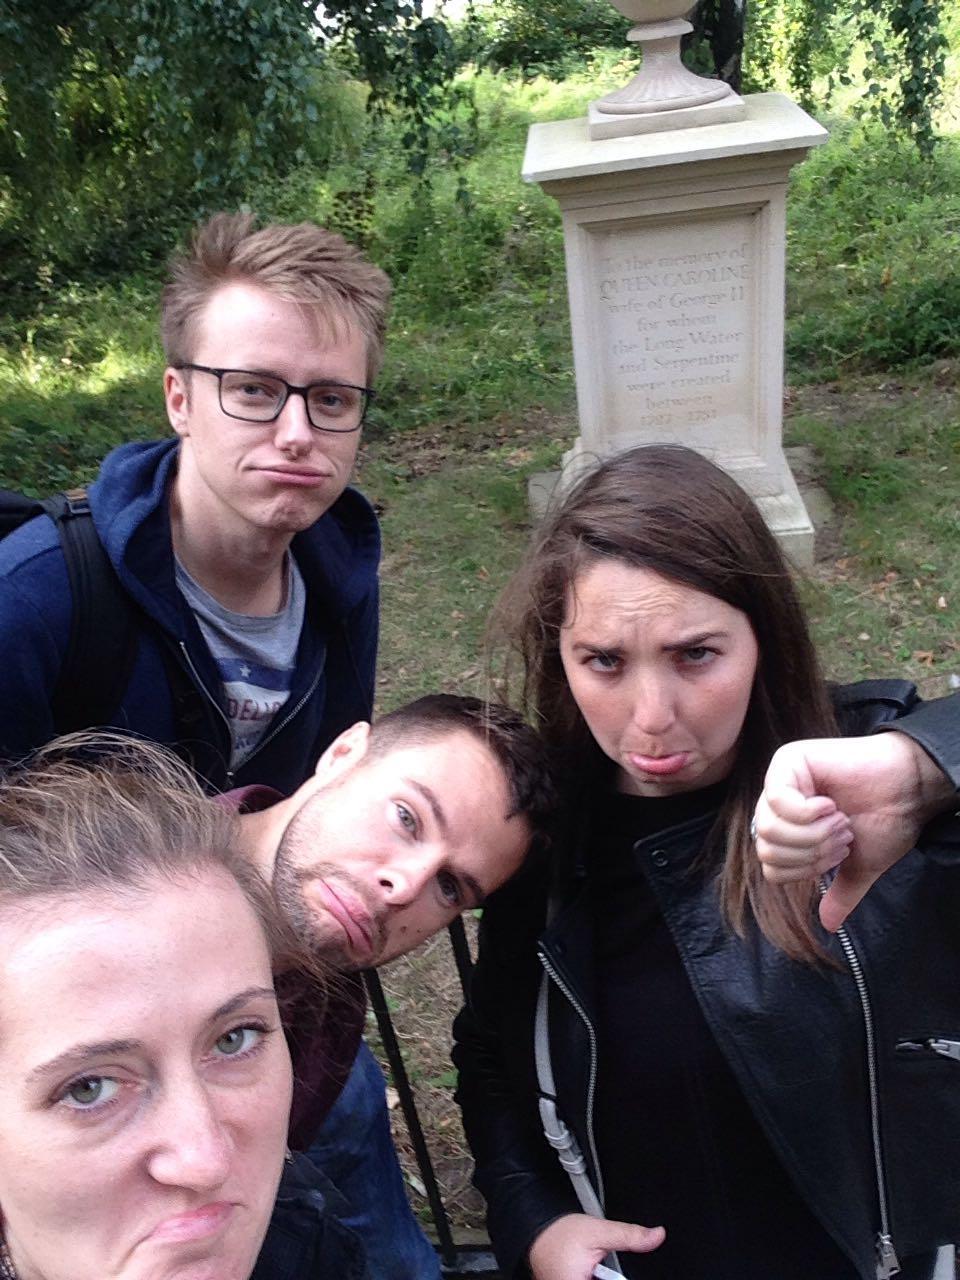 Team Bravo not liking clue 6